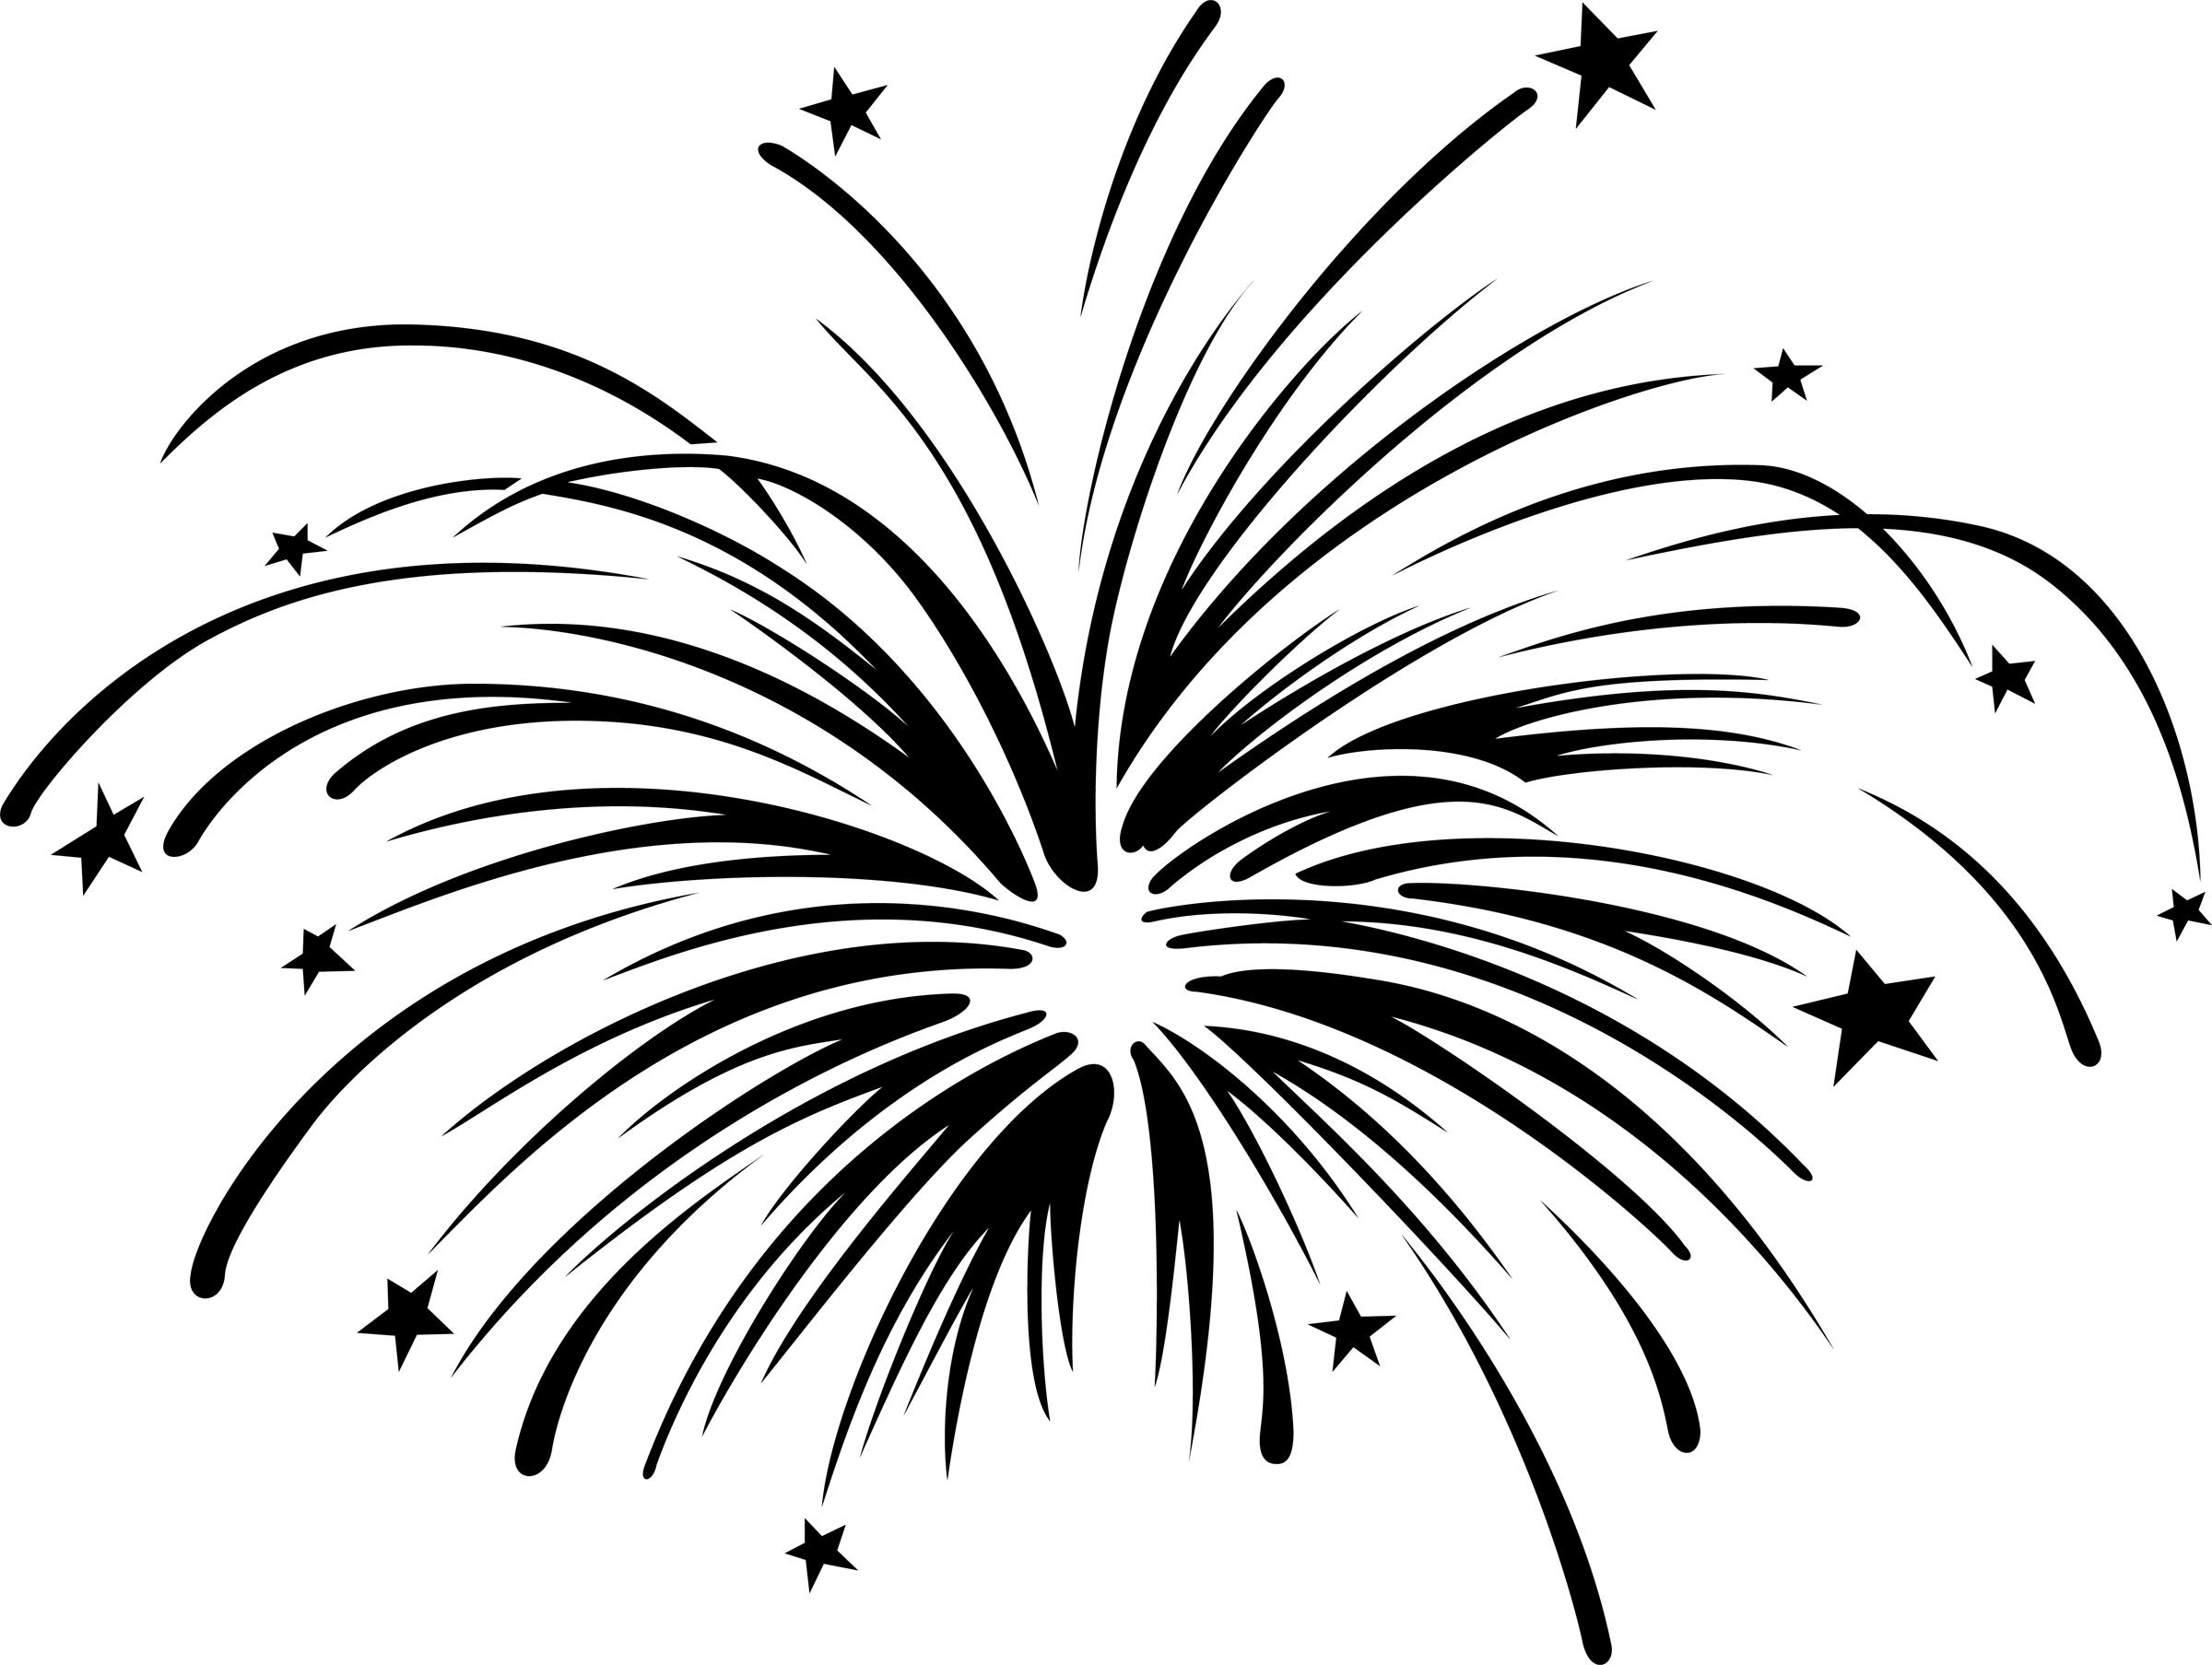 Firework clipart firworks. Free clip art download